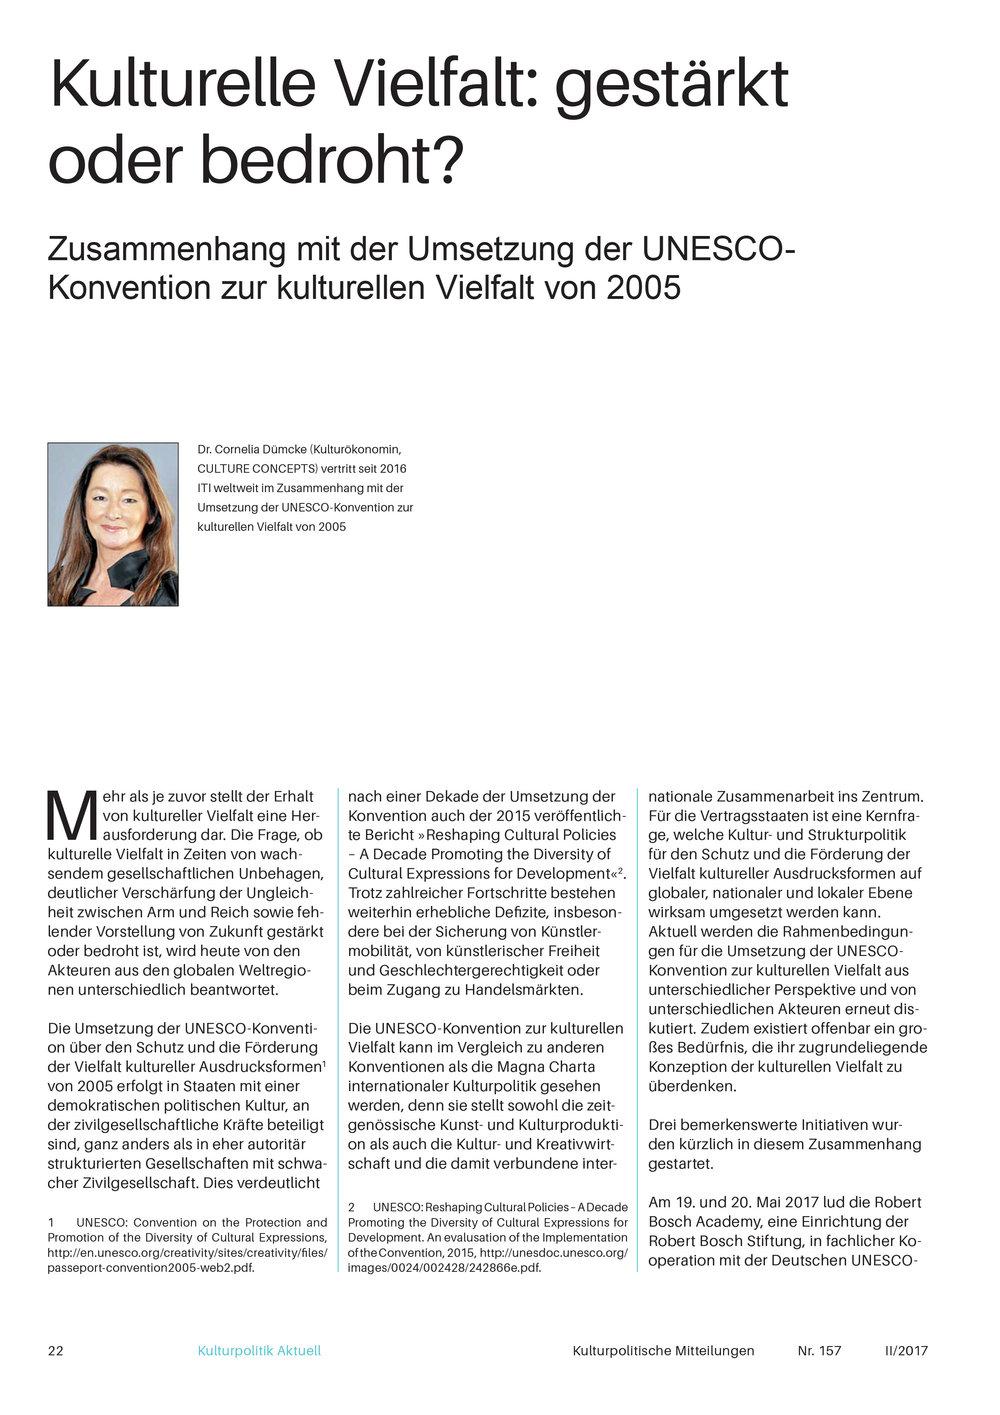 2017_kumi157_cornelia dümcke_2005er UNESCO Konvention-1.jpg